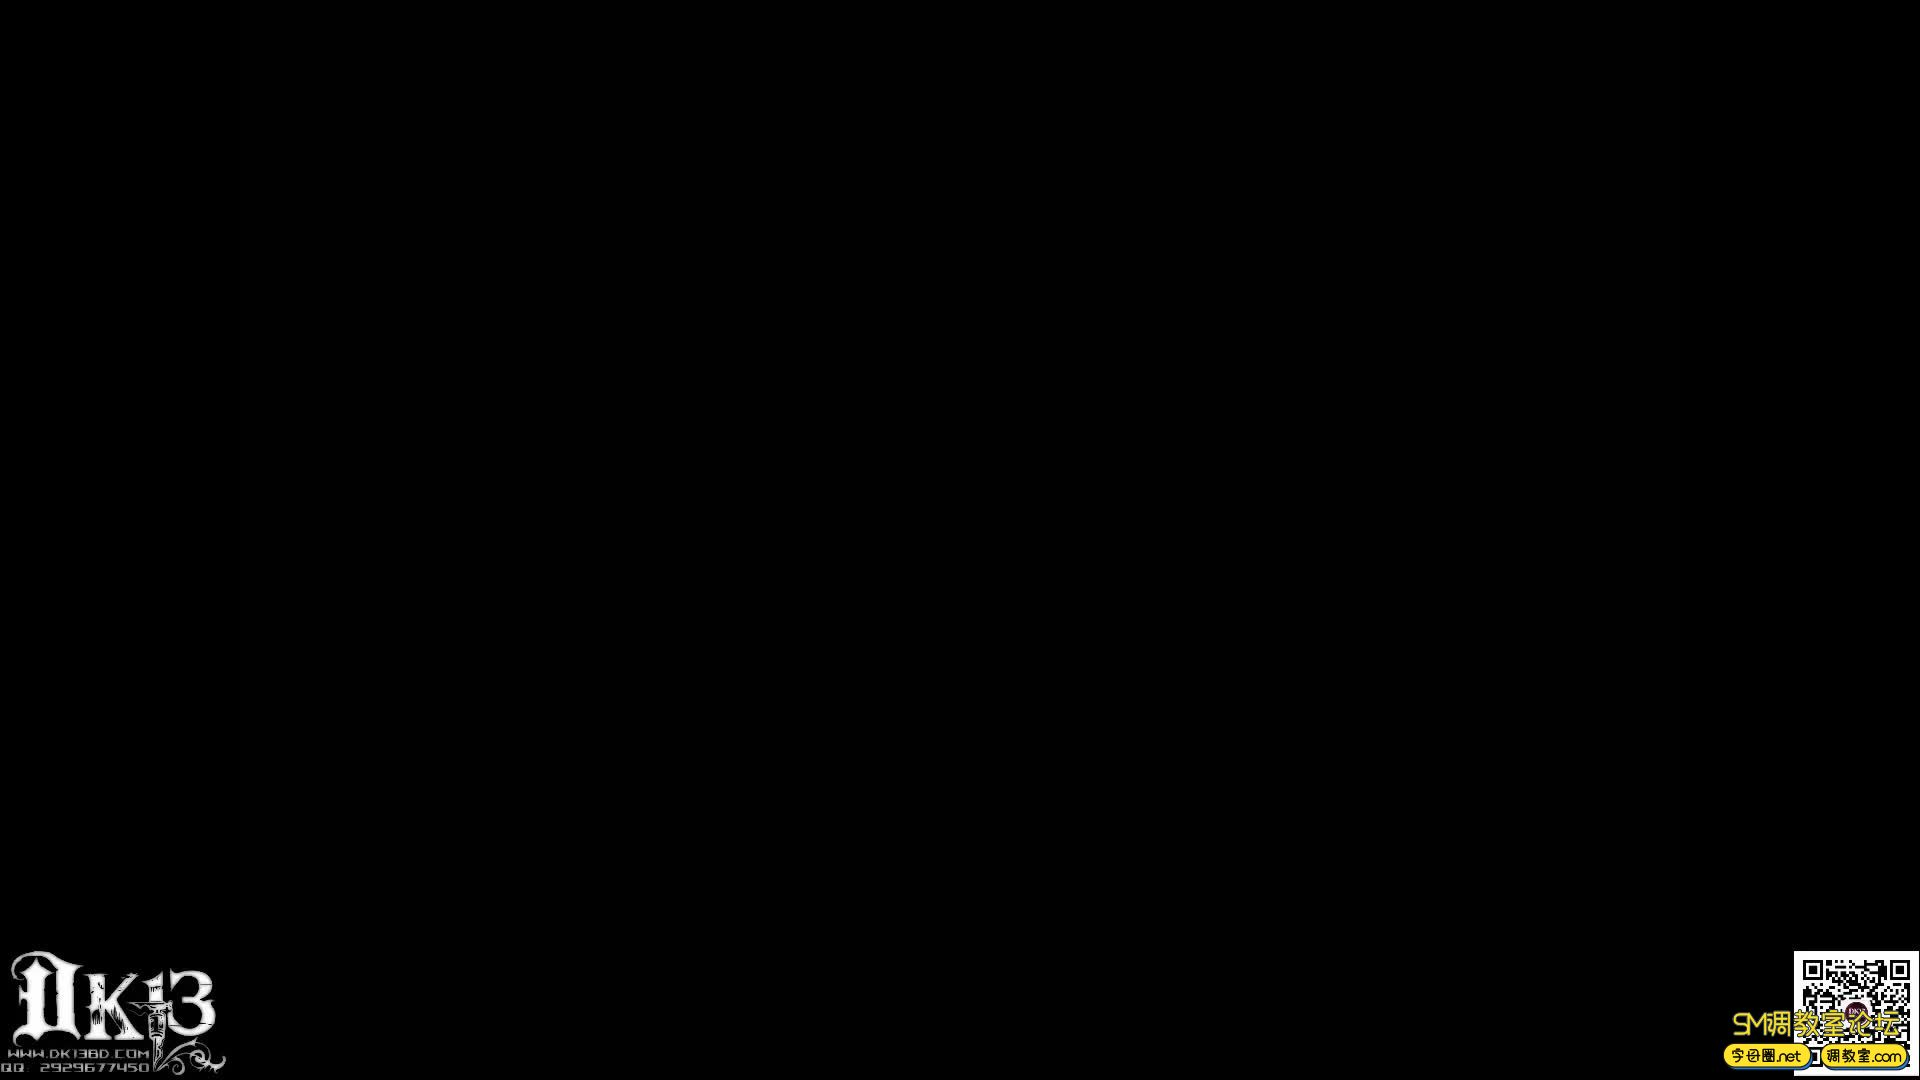 DK-13美束馆 贝贝 莹莹 夜店陷阱-第五集 经过几次T教后,二人渐入佳境-视频截图4